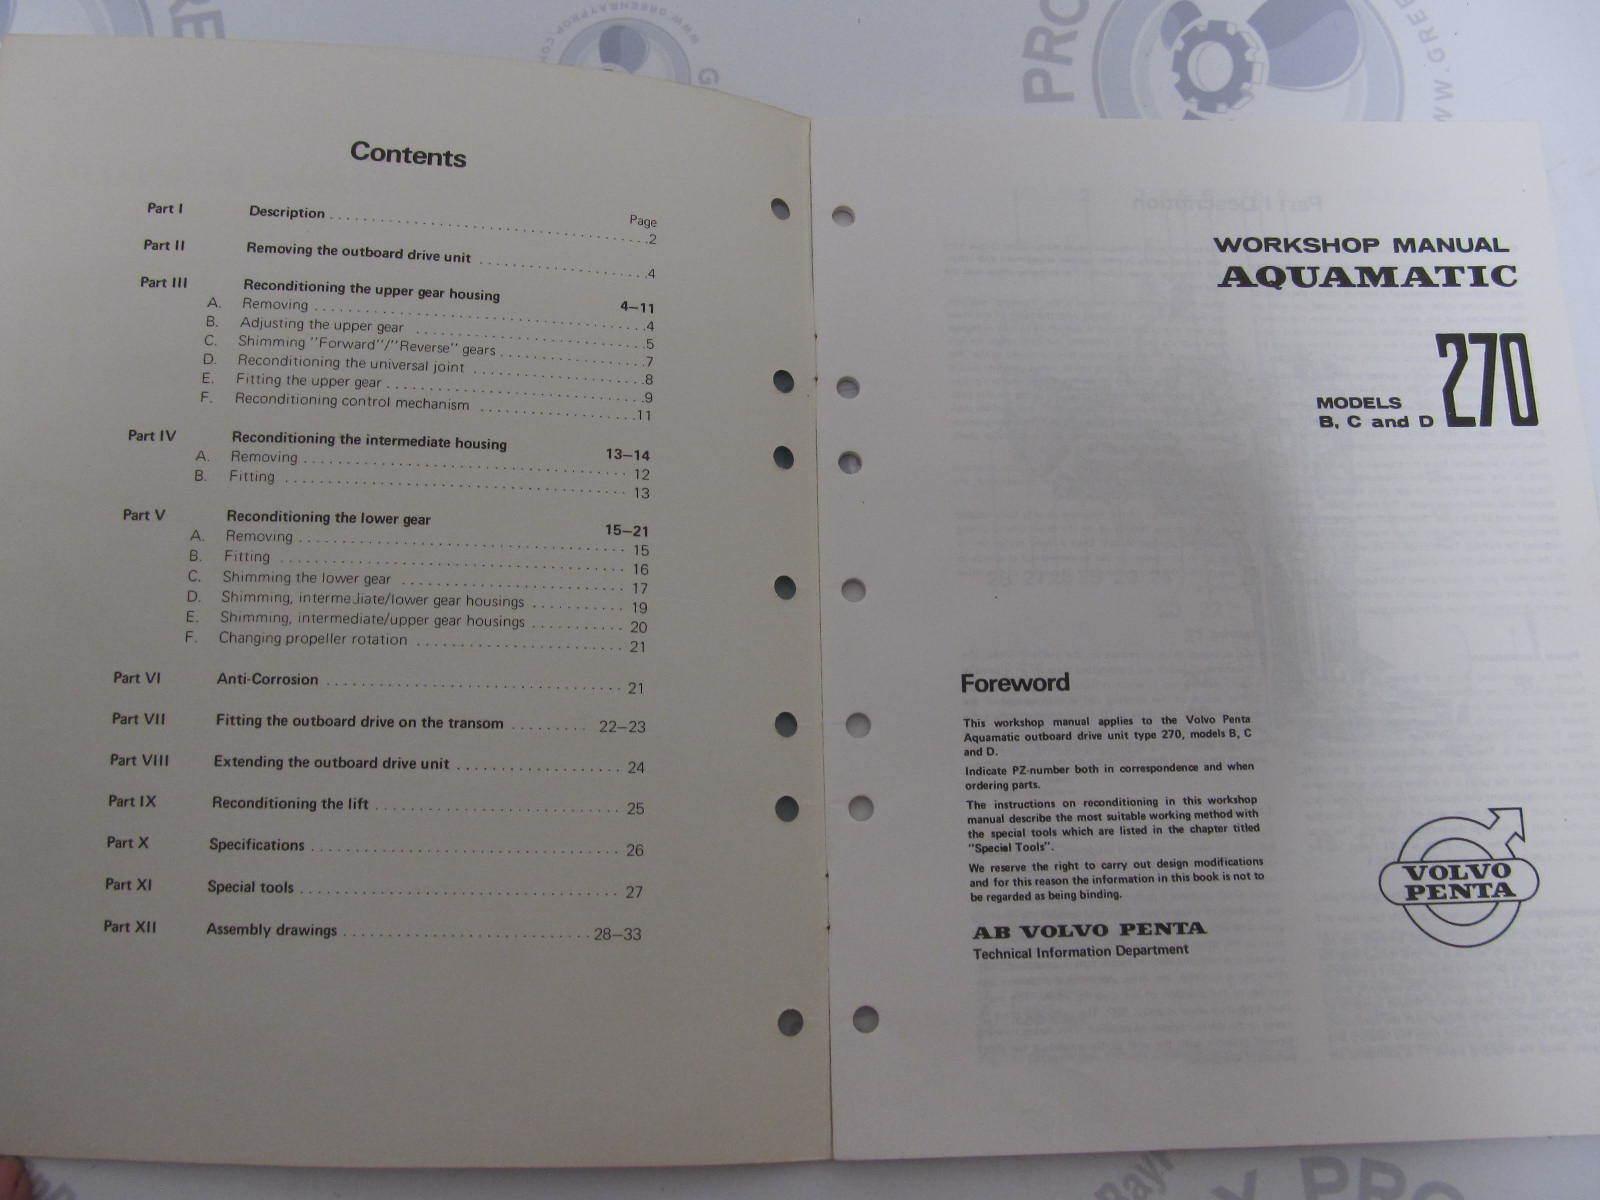 7724371 5 volvo penta aquamatic service workshop manual Volvo Penta Outdrive Volvo Penta Outdrive